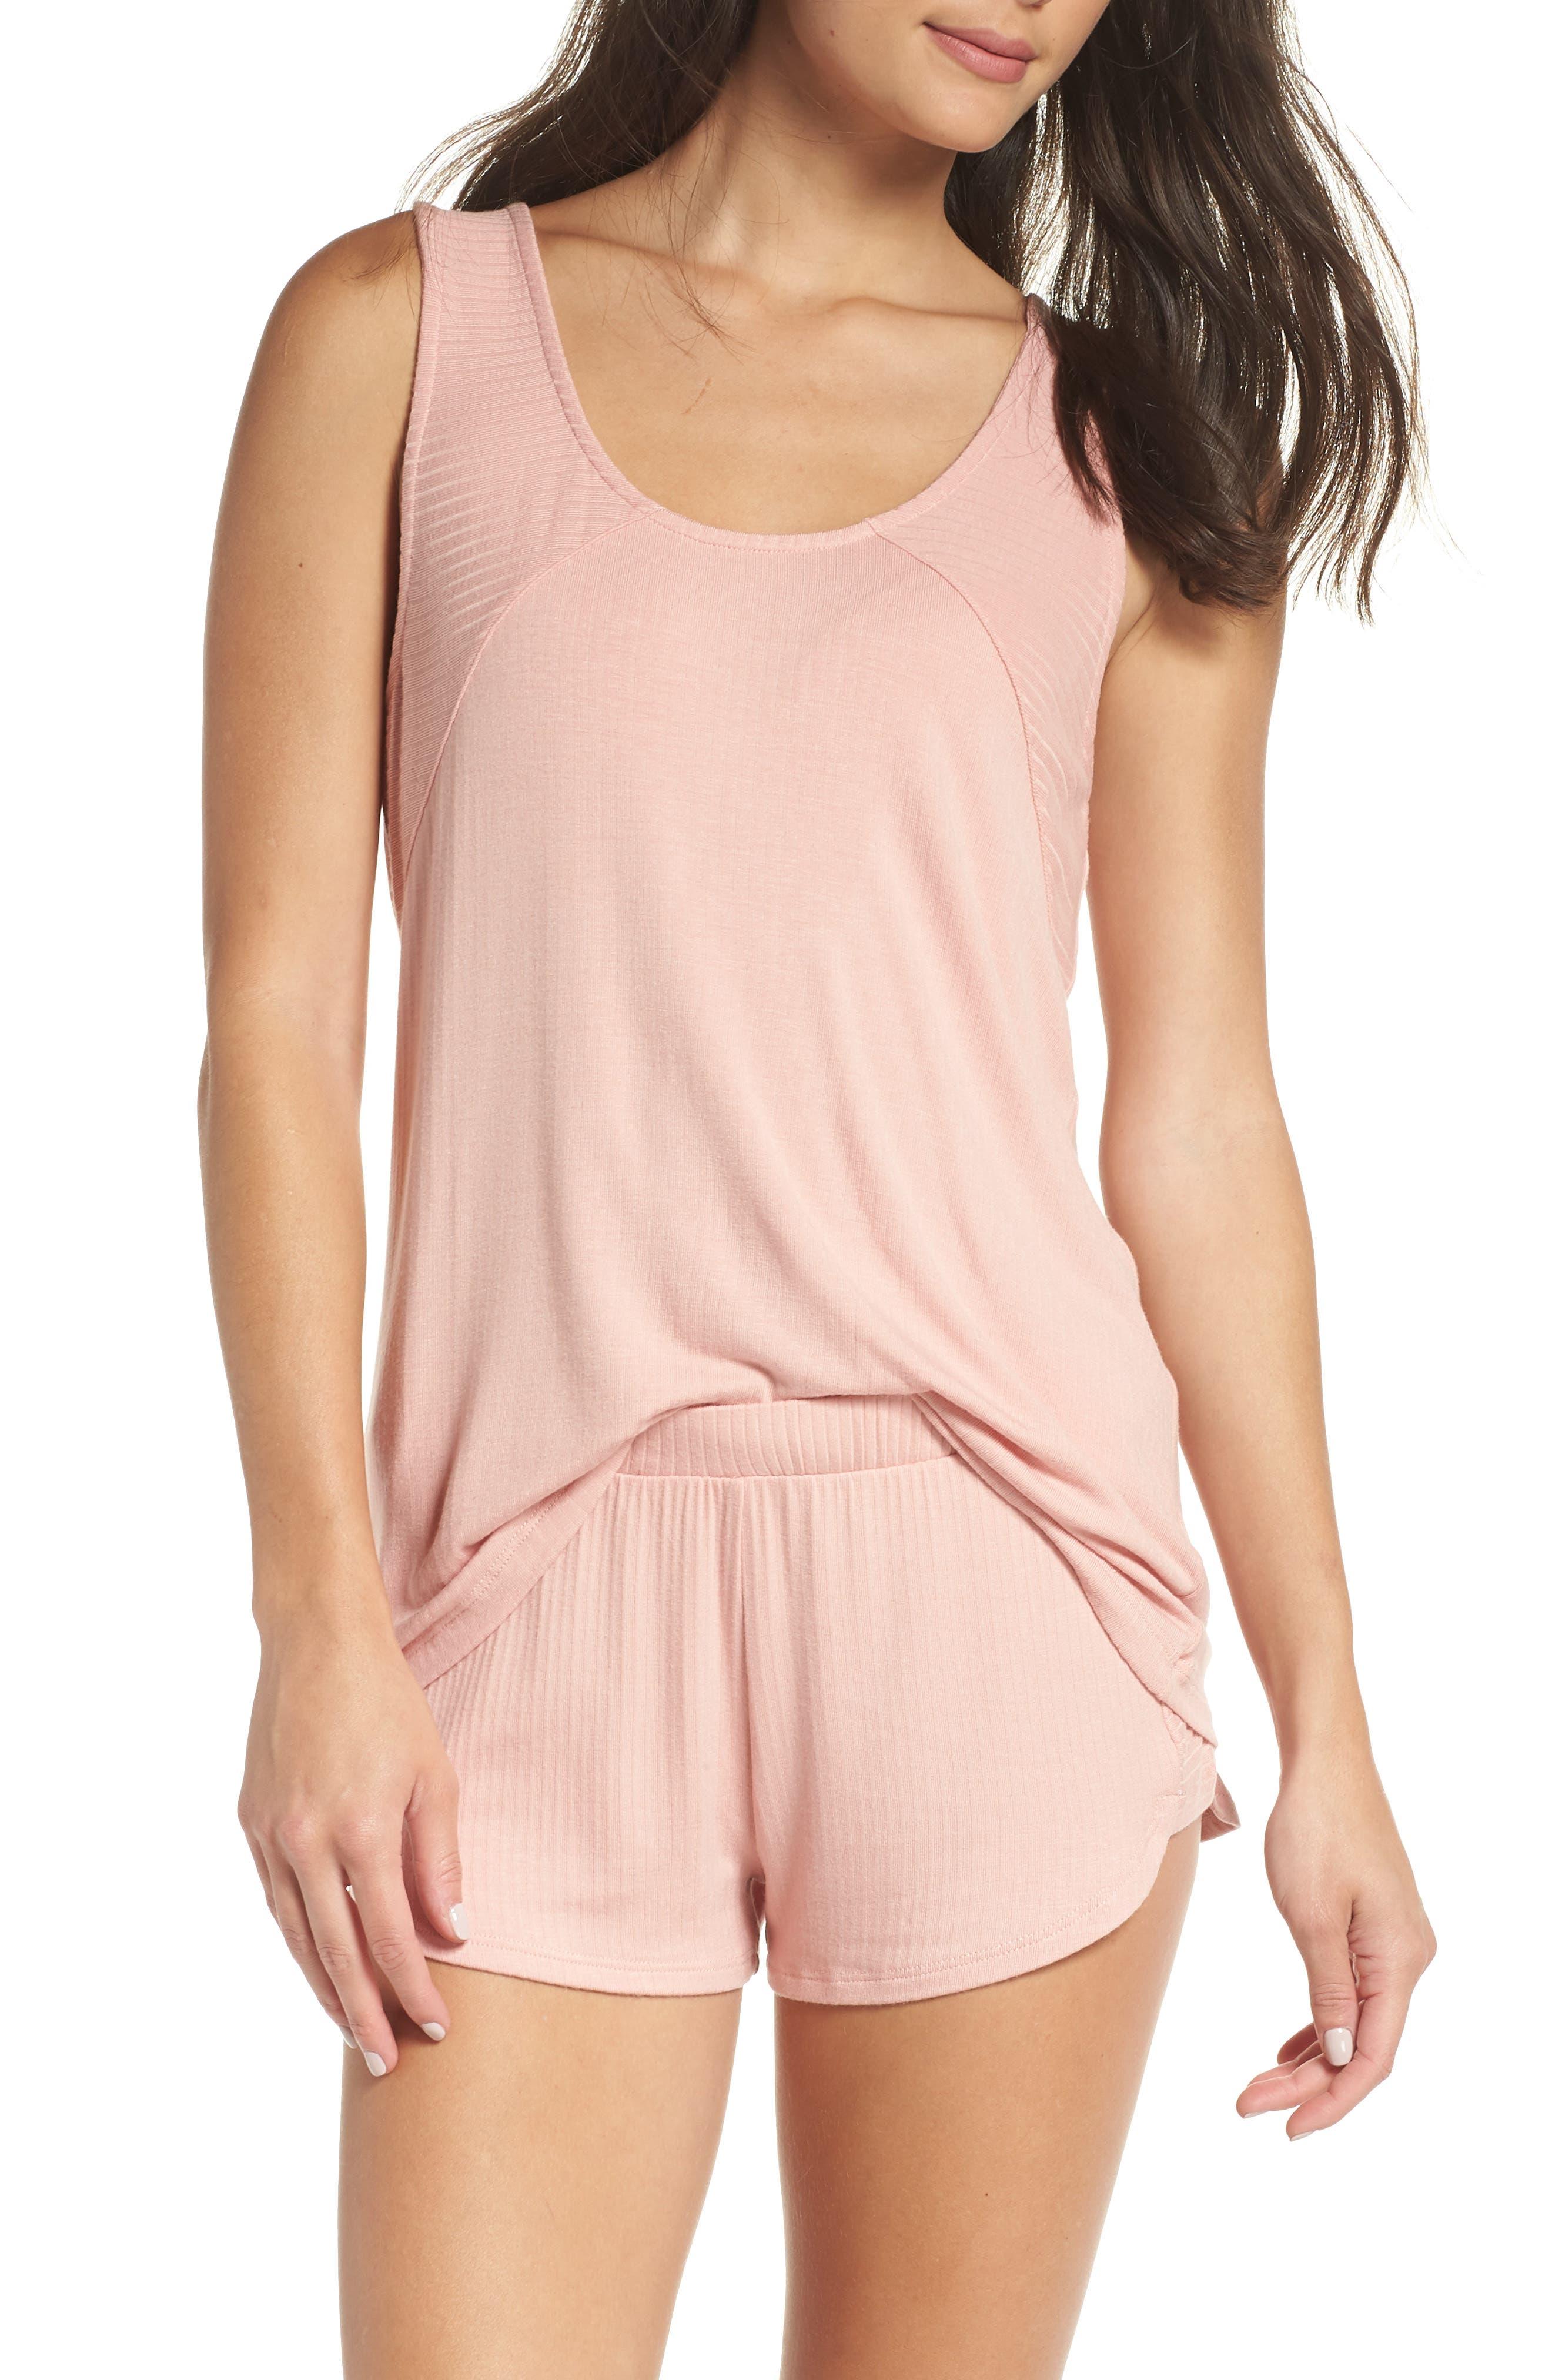 Cosabella Phoenix Camisole, Pink